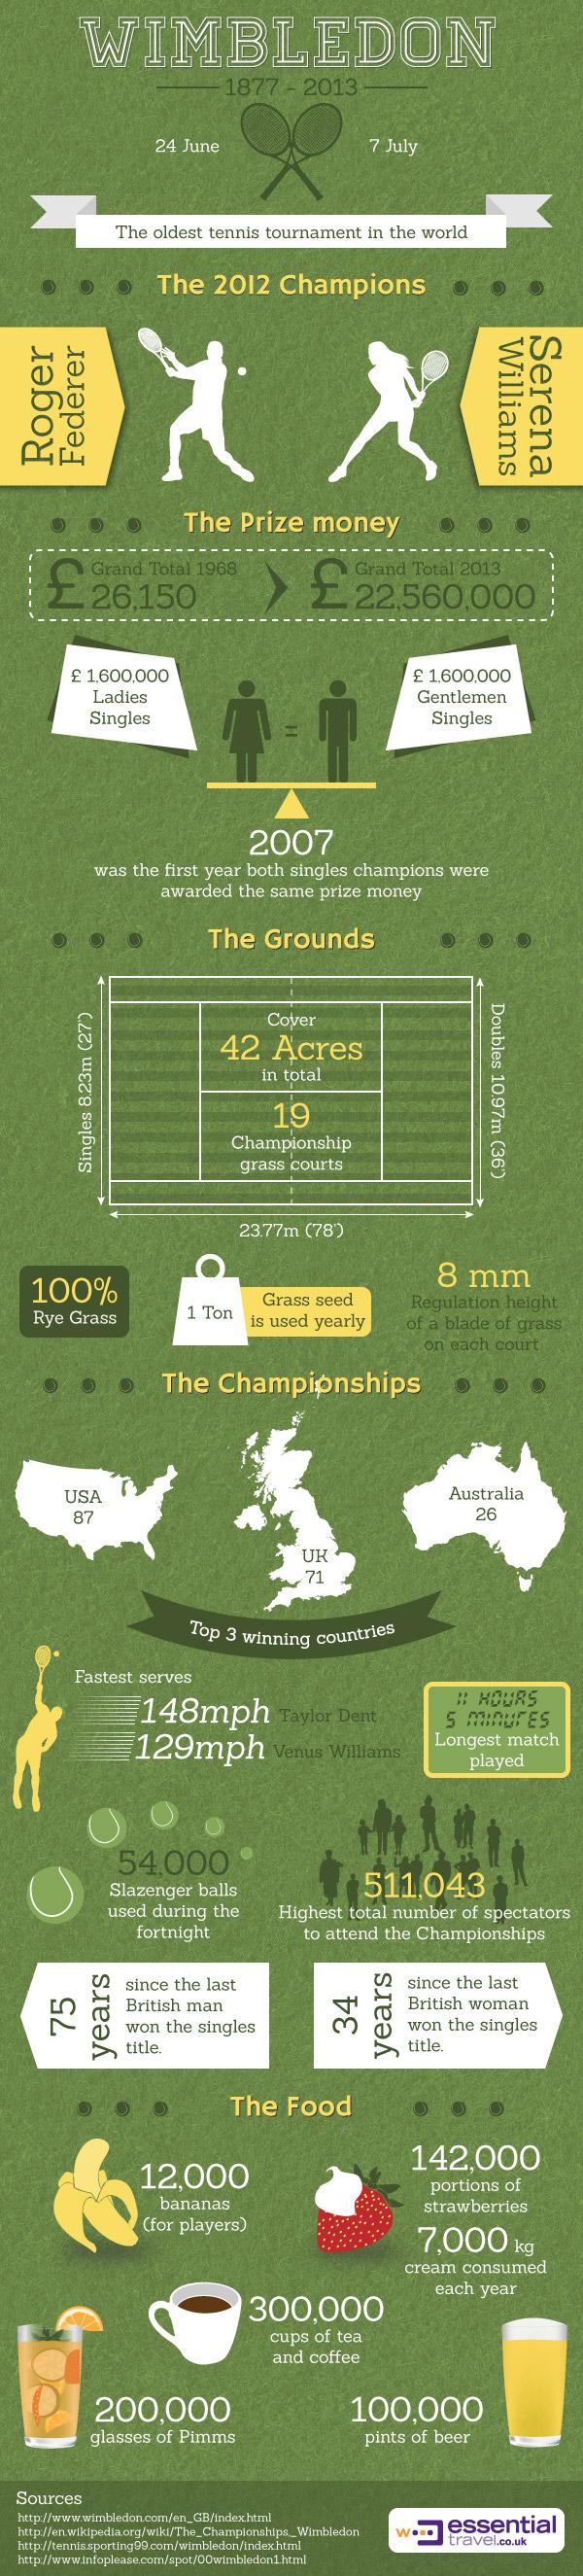 Wimbledon 2013 Infographic